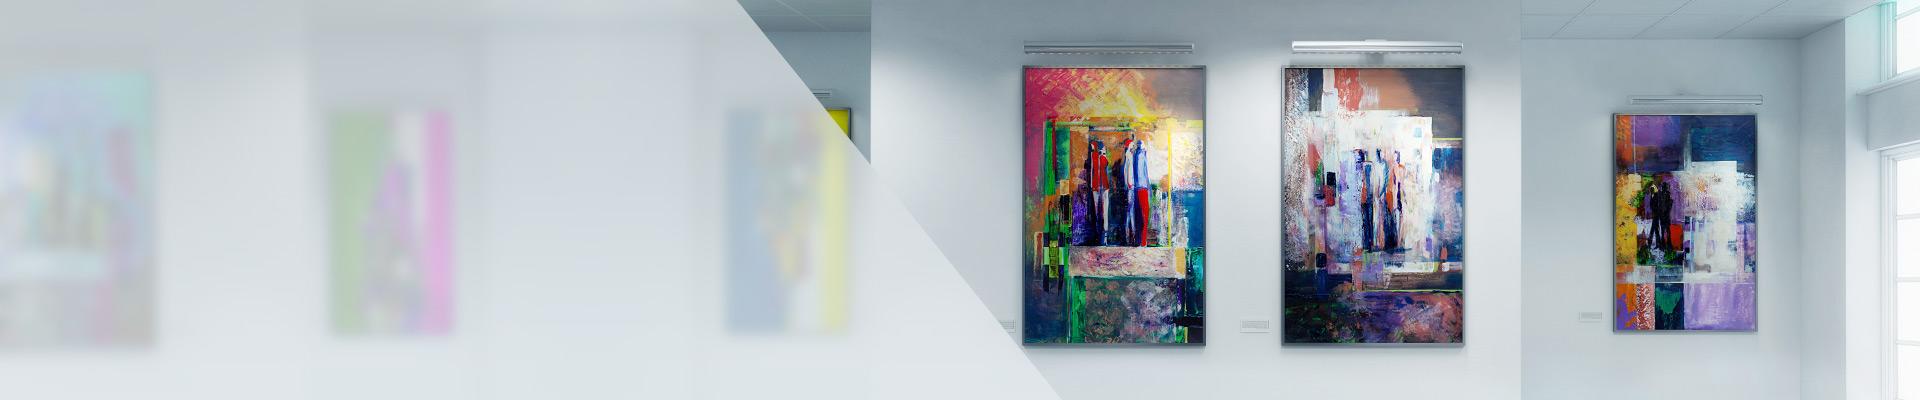 Bunte Kunstgemälde an der Wand